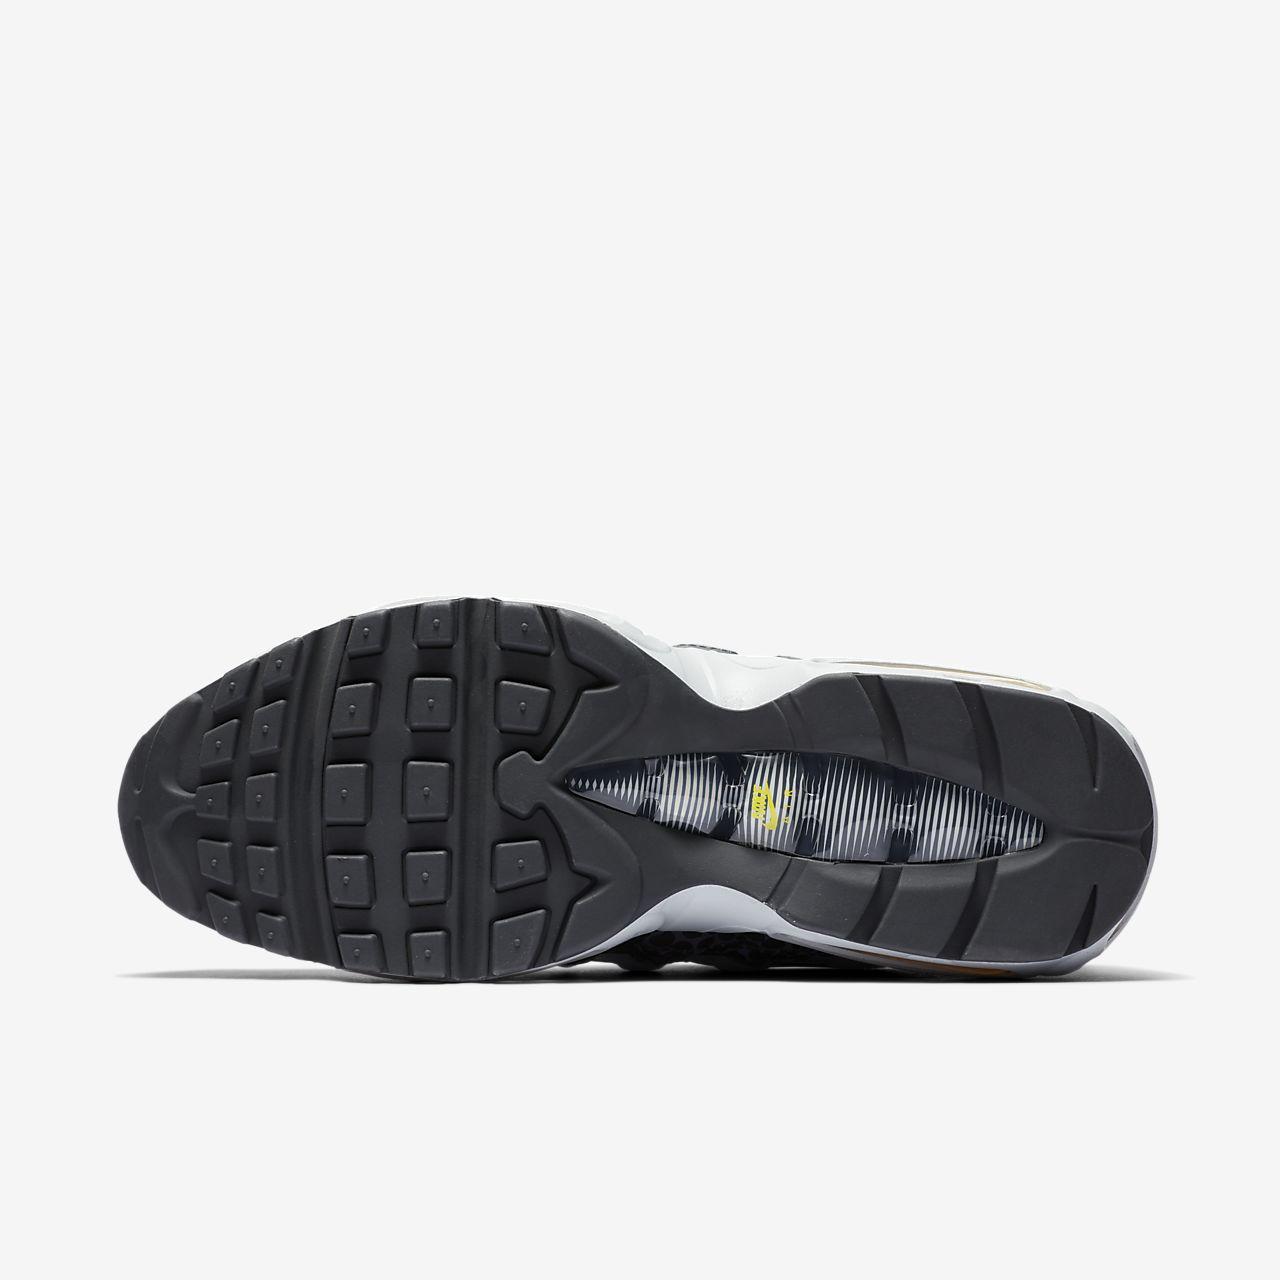 hot sale online 17dda e3842 ... Nike Air Max 95 SE Men s Shoe